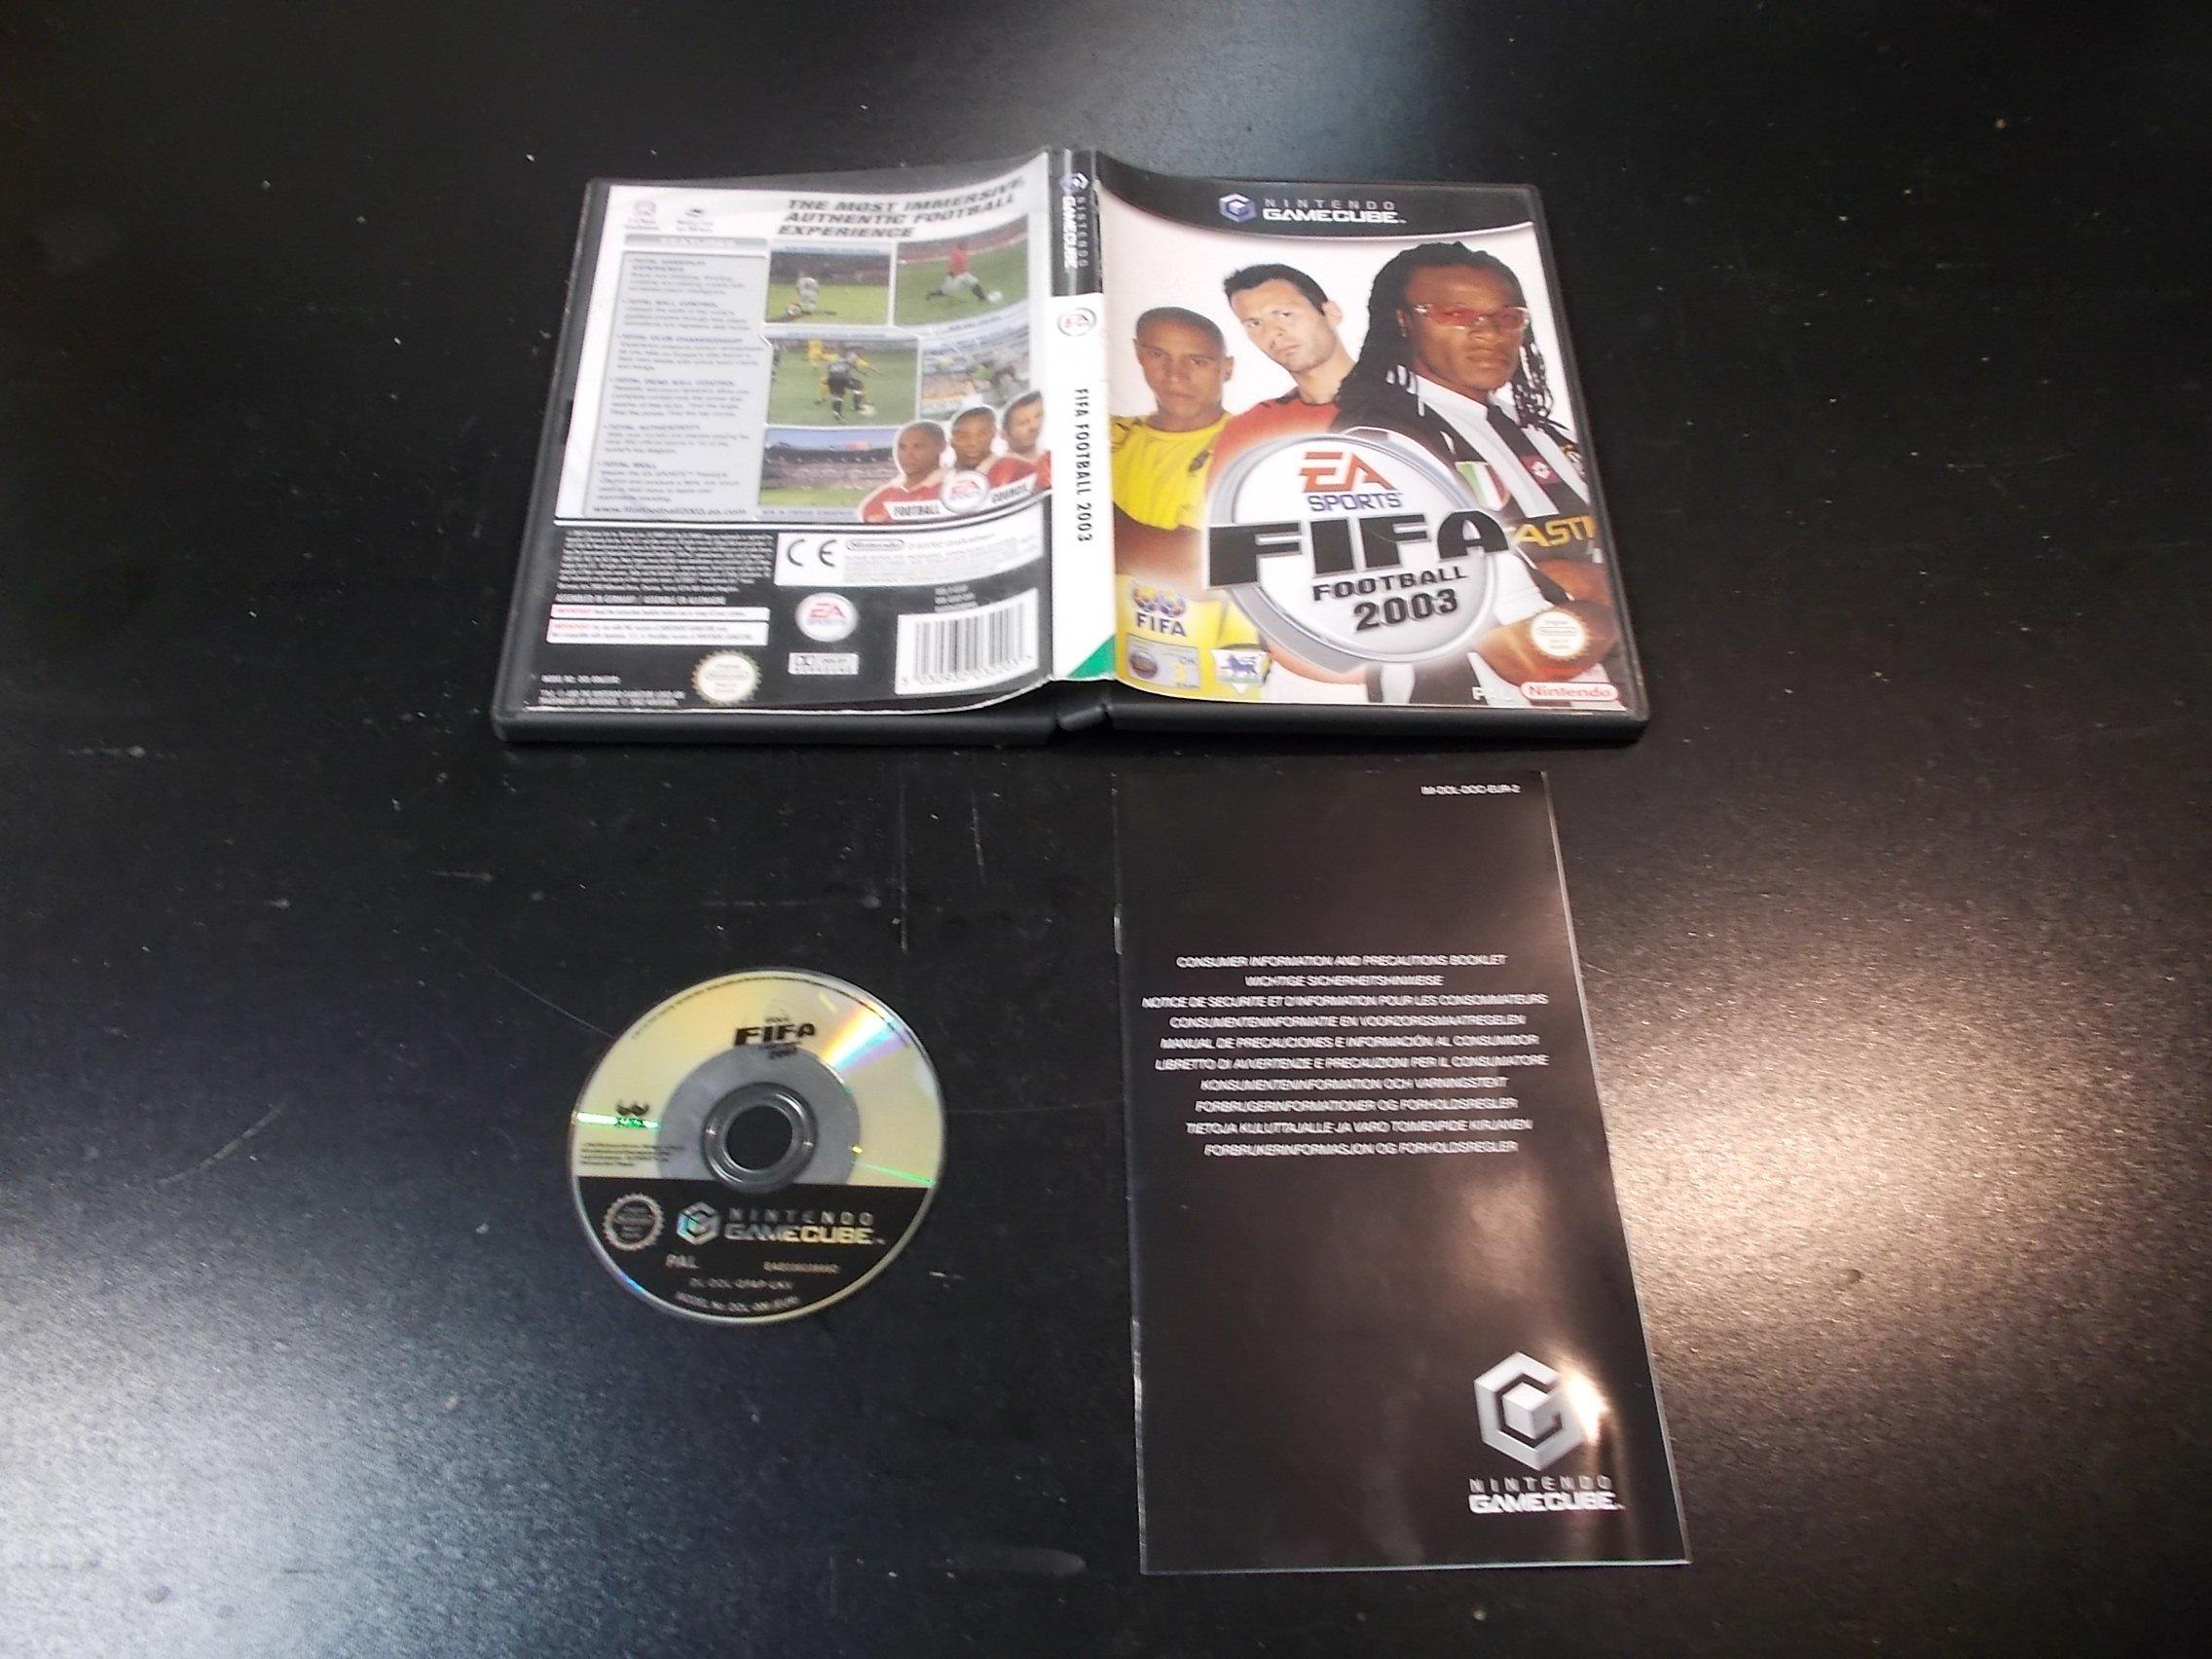 FIFA FOOTBALL 2003 - GRA Nintendo GameCube - Sklep